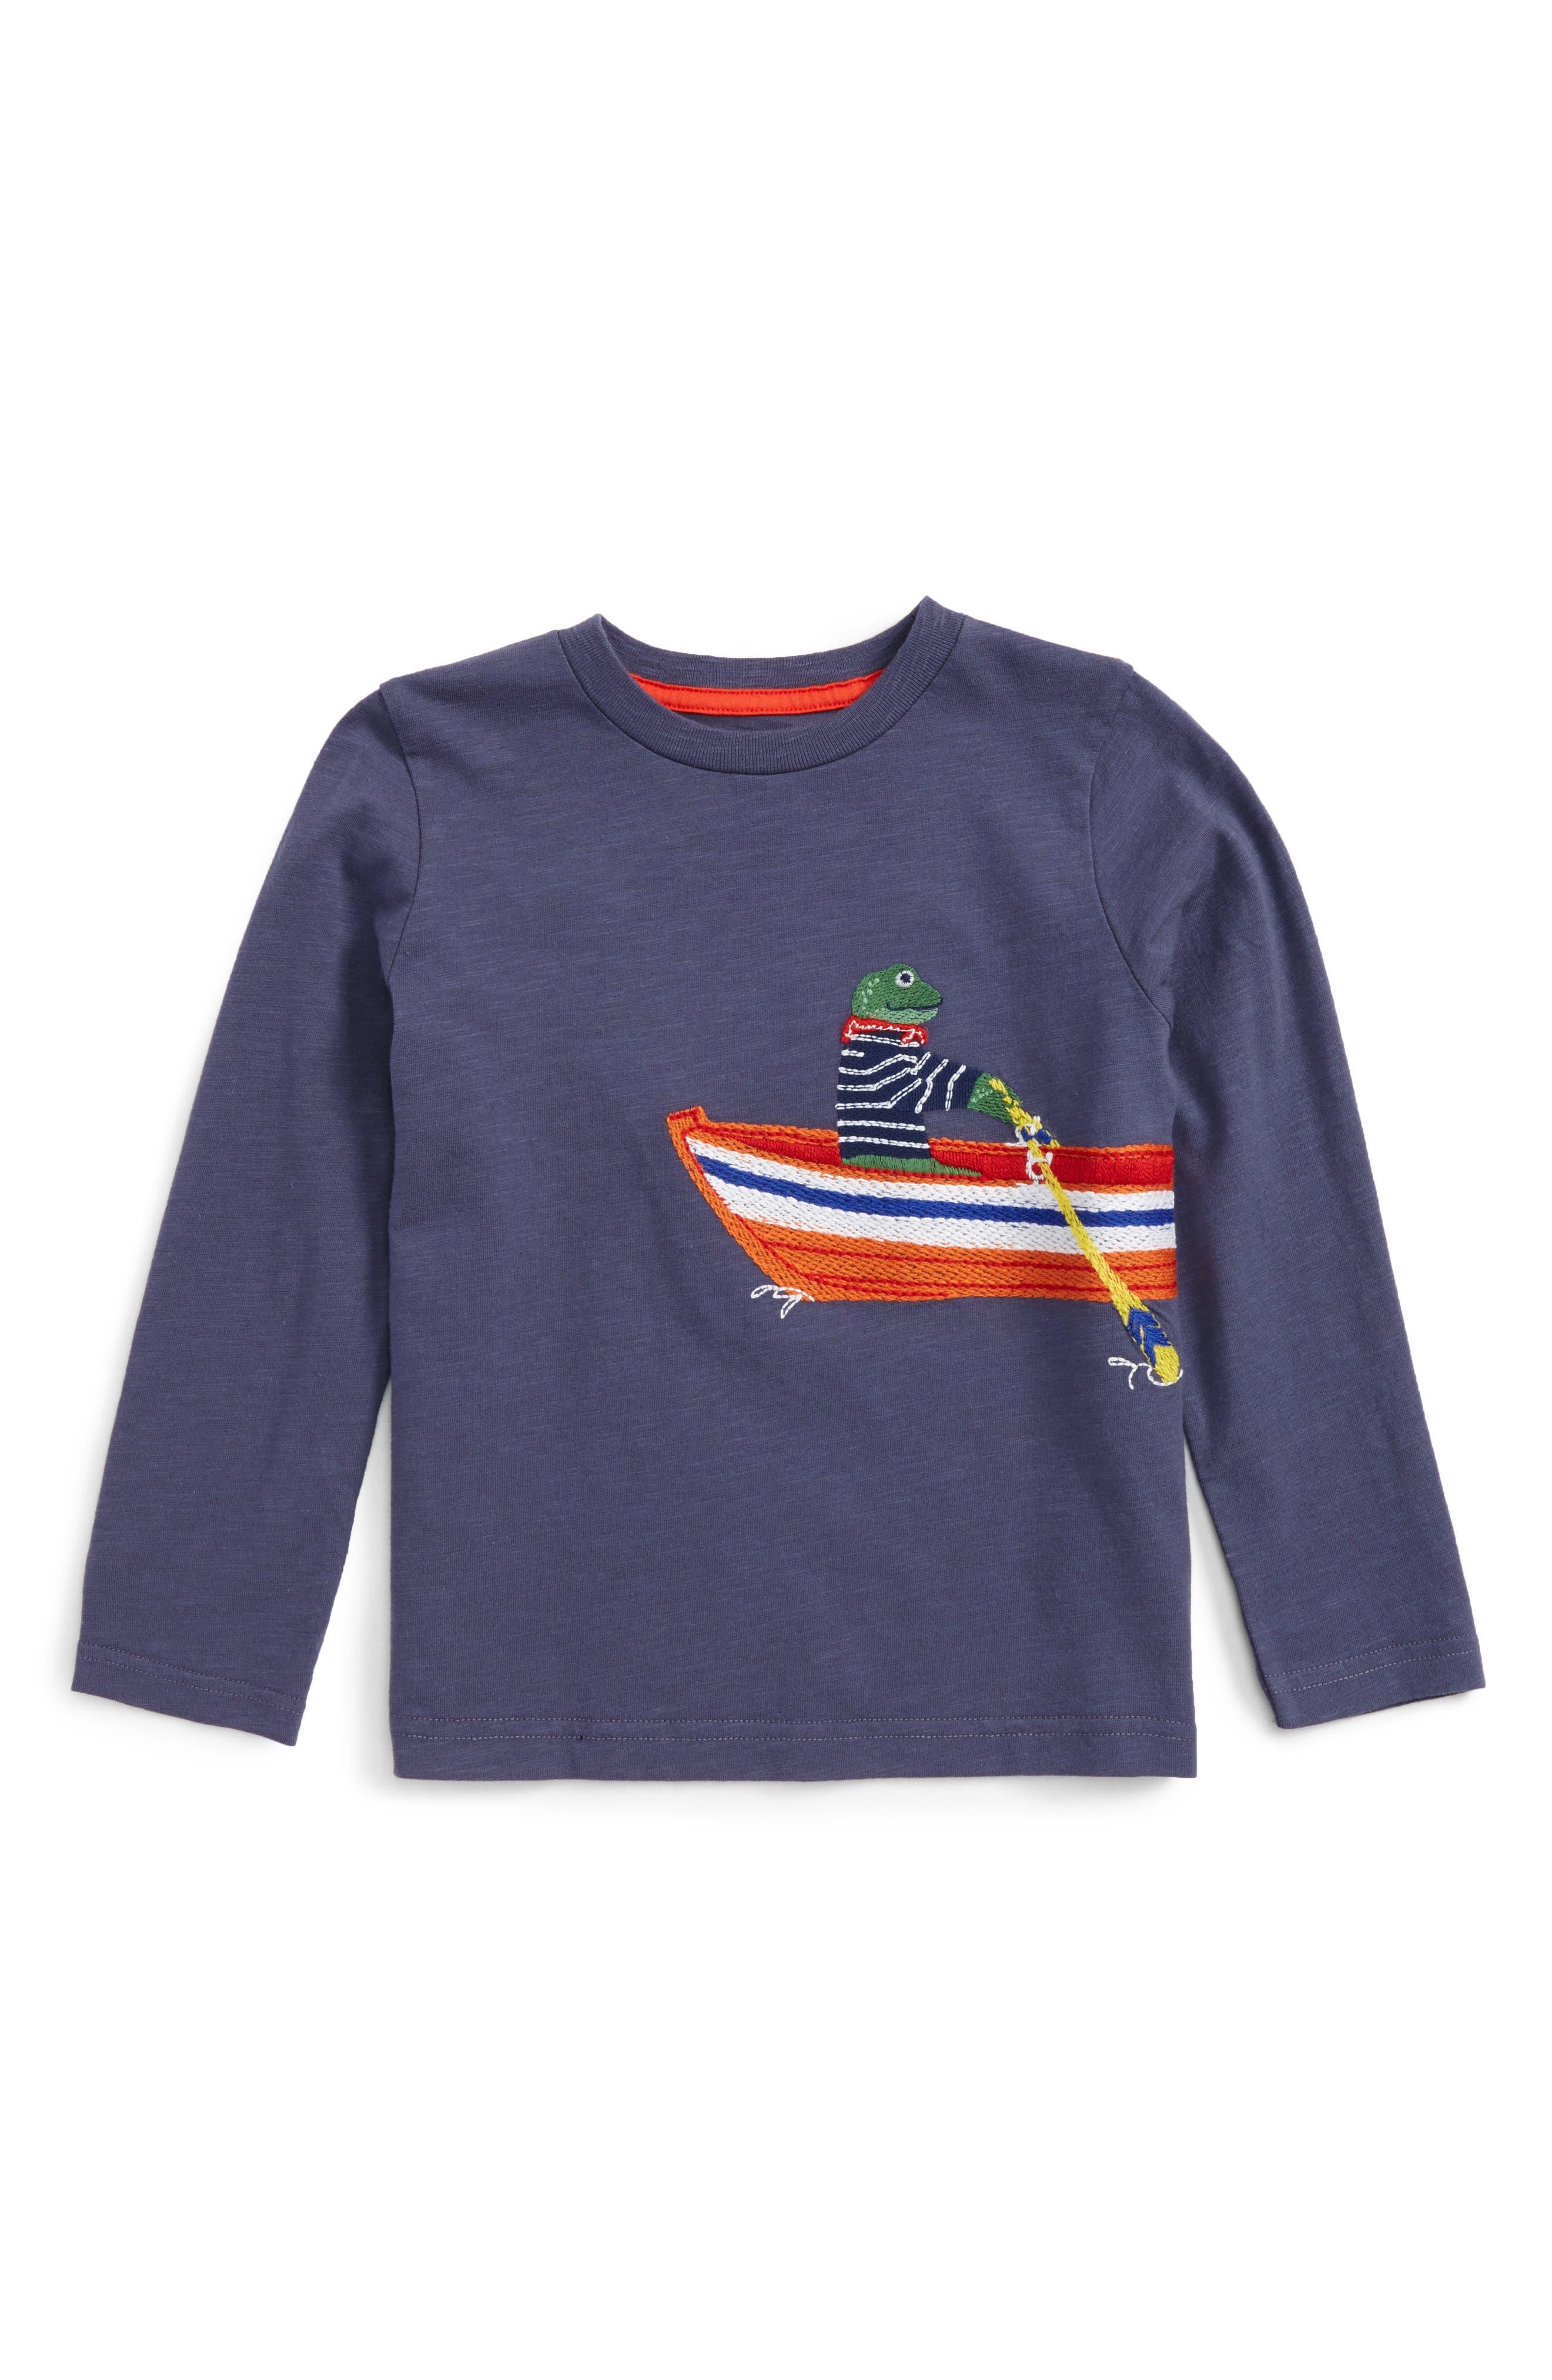 Superstitch T-Shirt,                         Main,                         color, Meteorite Grey Frog